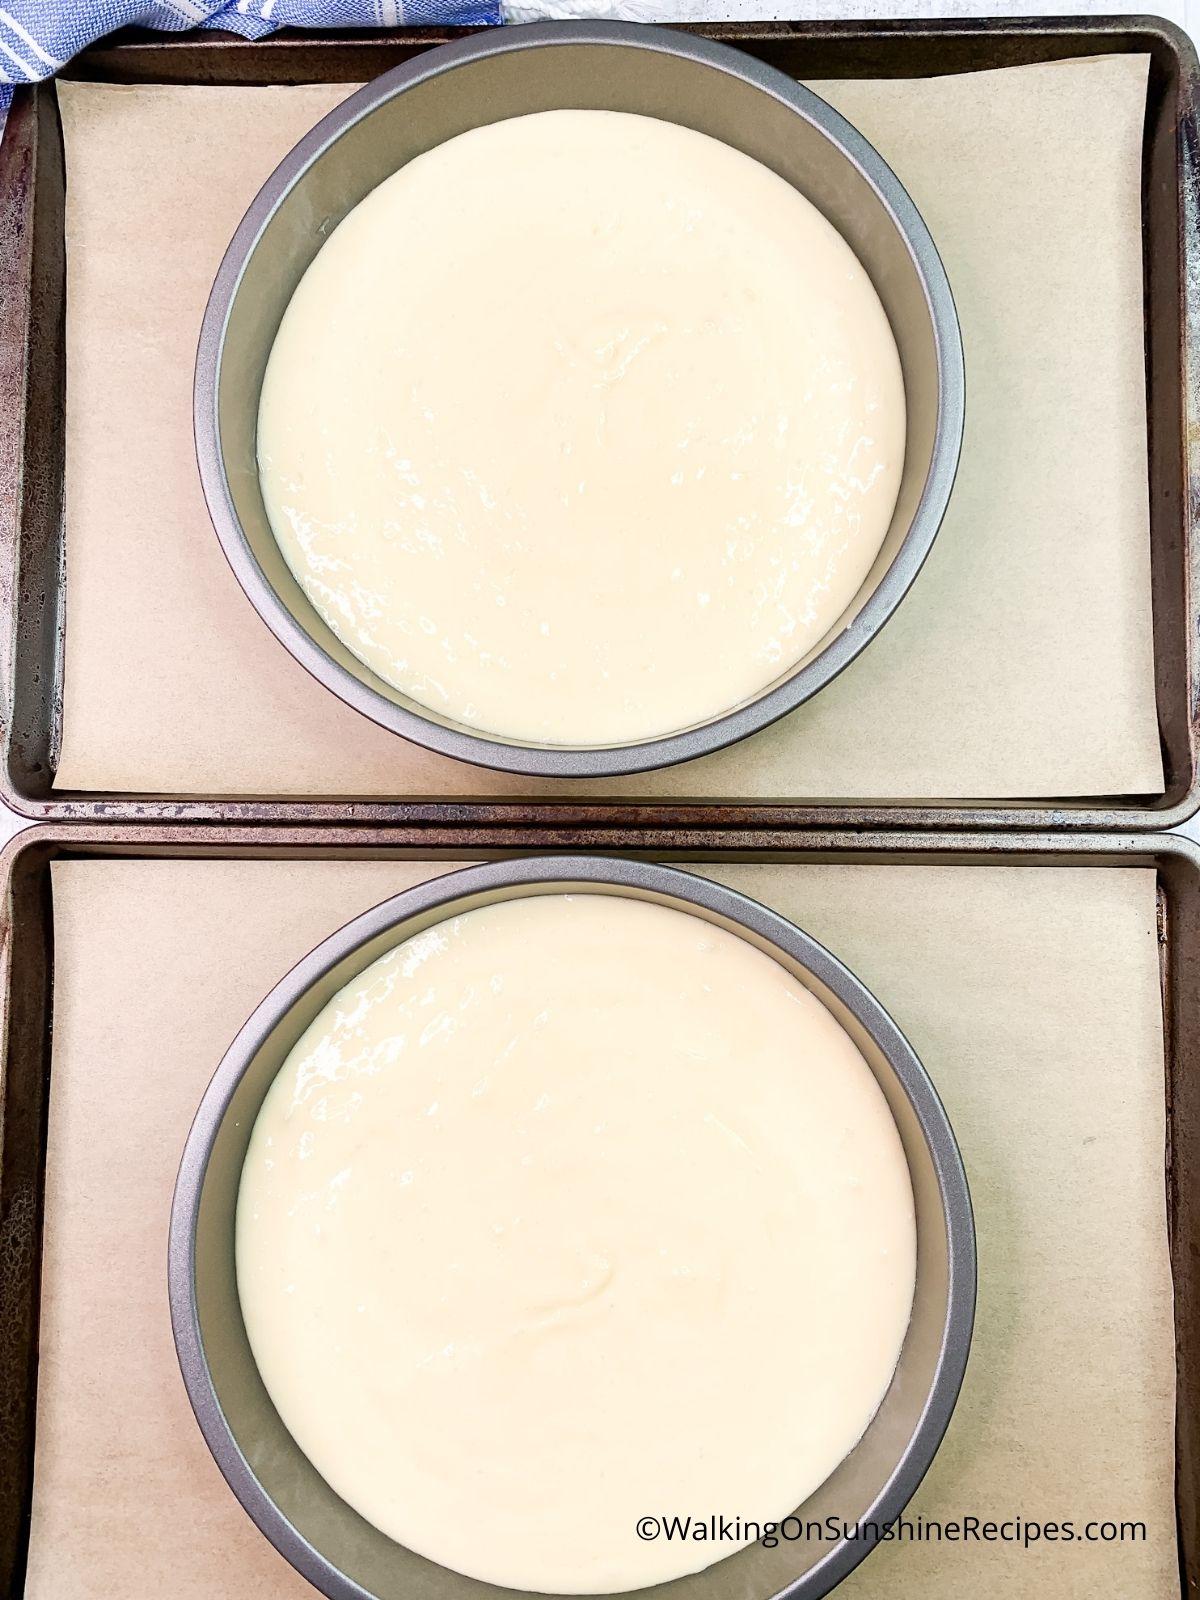 cake batter in pans before baking.